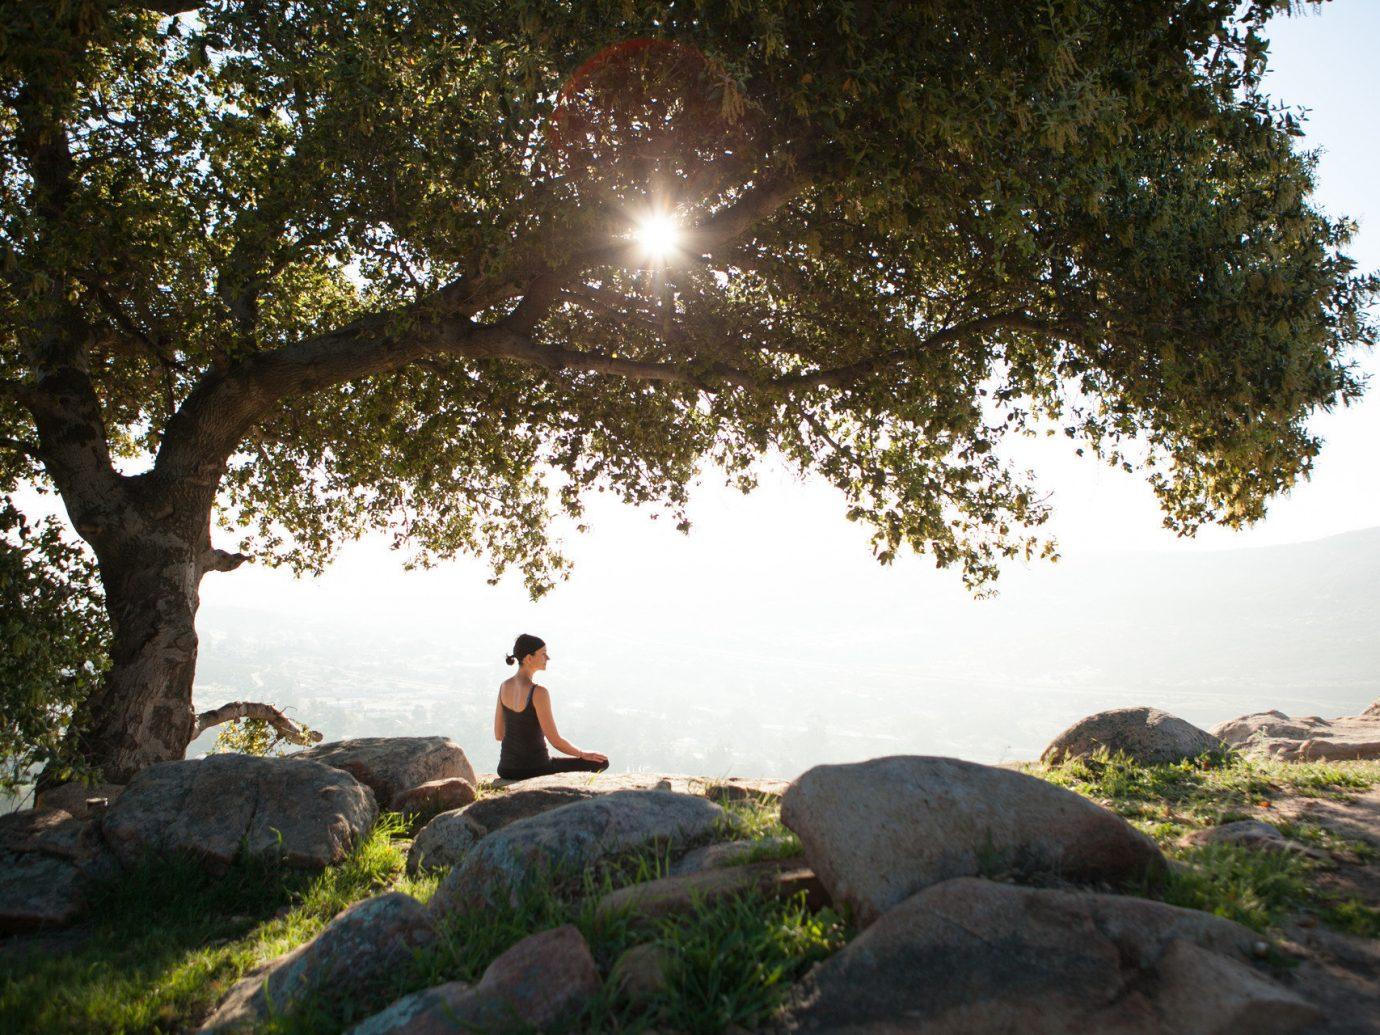 Health + Wellness Hotels Spa Retreats tree outdoor rock Nature man woody plant sunlight water feature autumn plant hillside